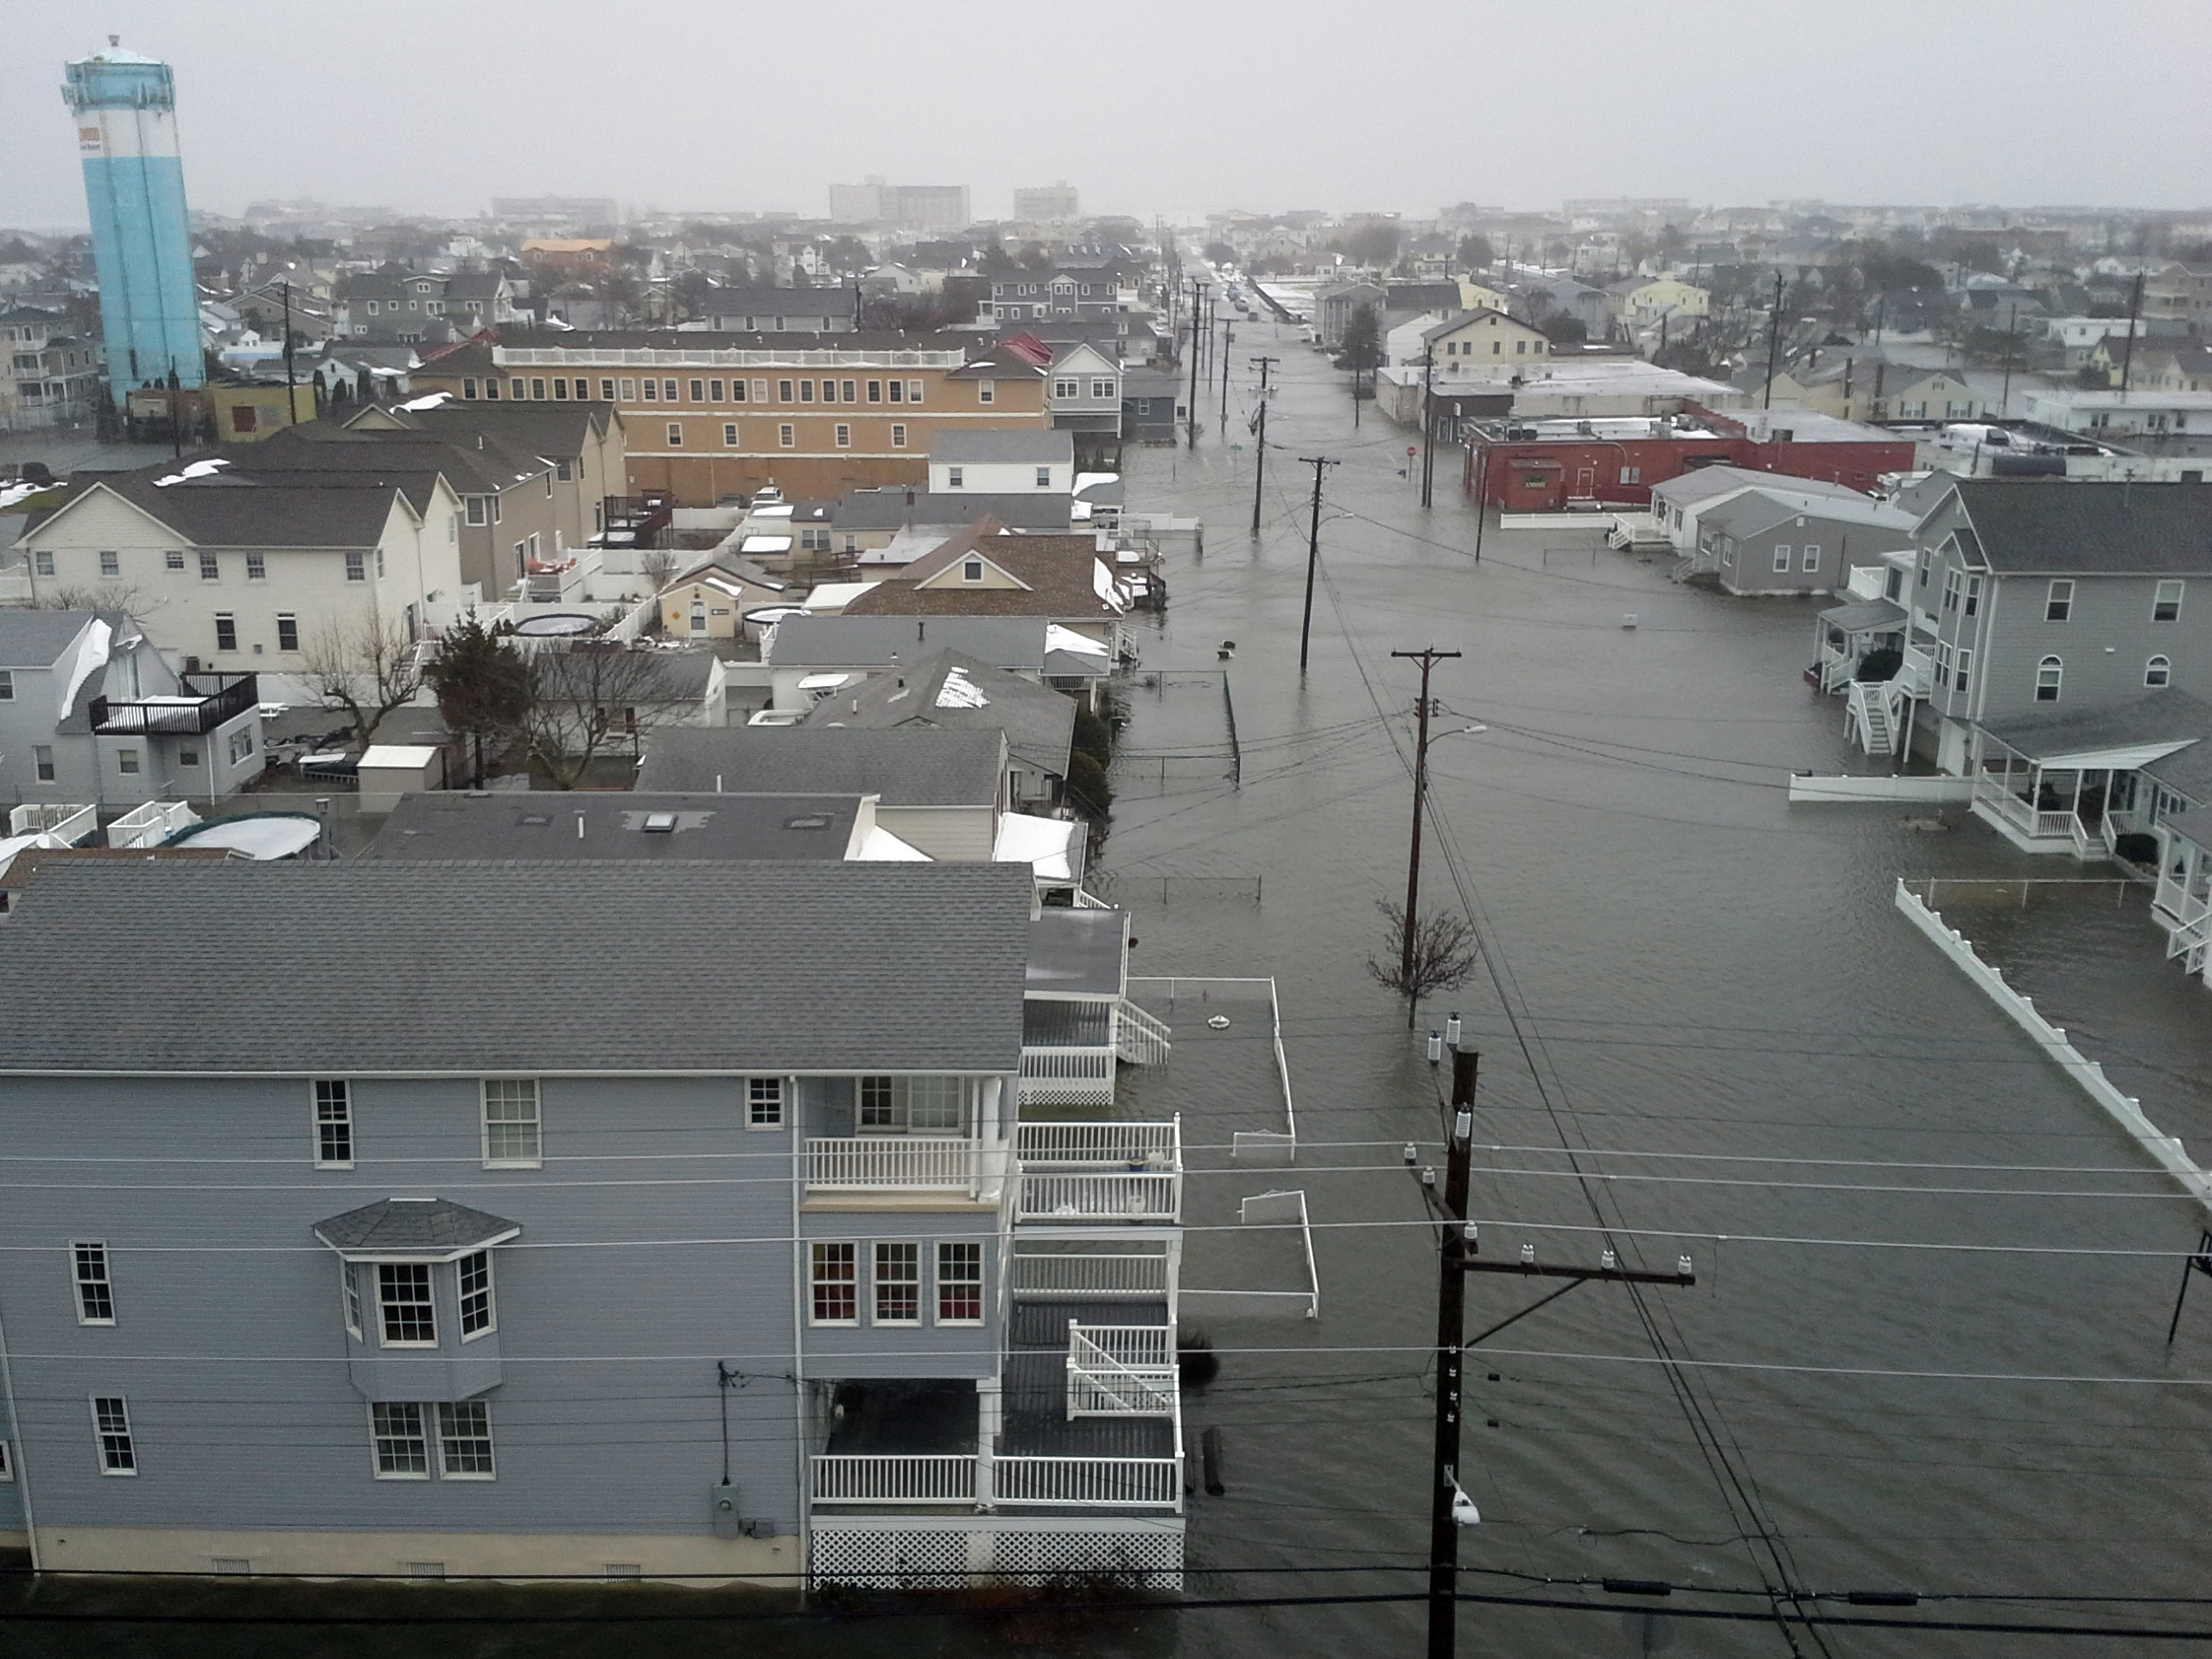 Coastal-Flooding-Blizzard_Jan-2016-North-Wildwood-N-JAP_473254803498-Robb Nunzio